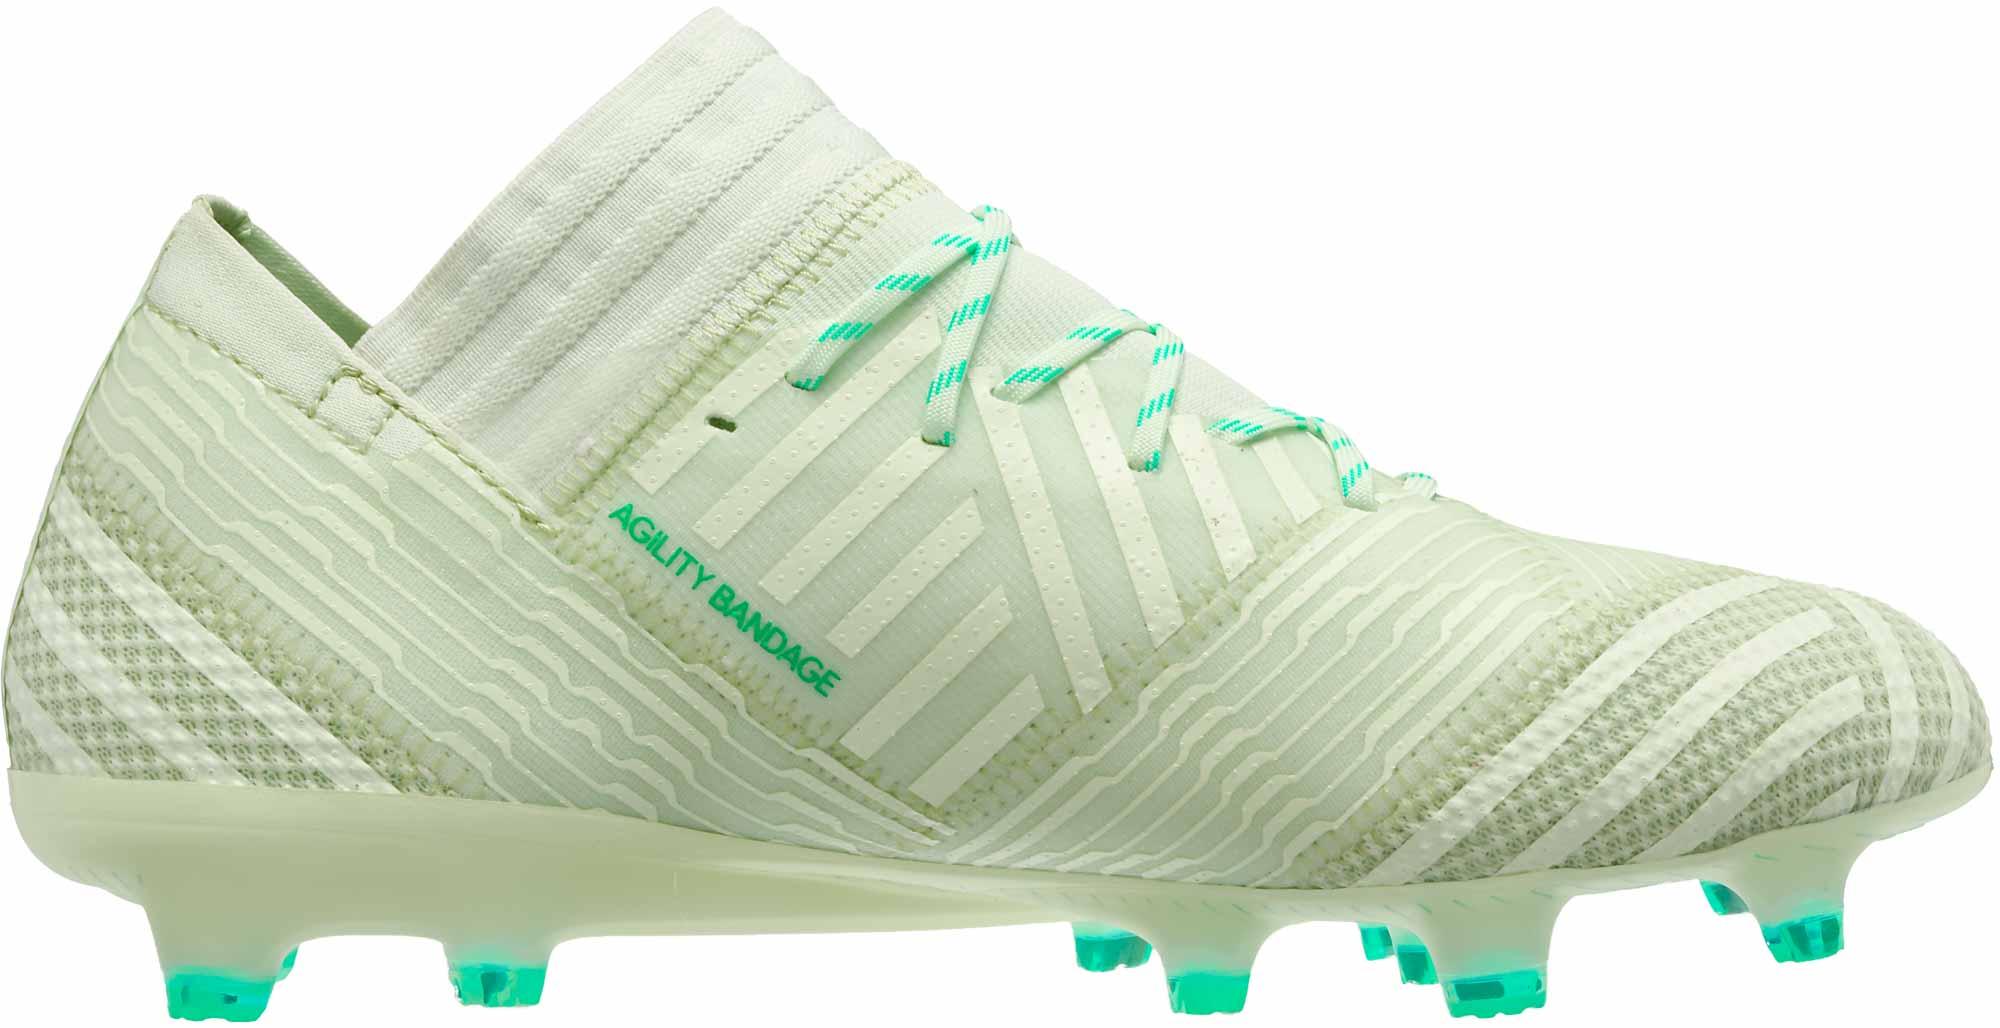 803d49971 adidas Nemeziz 17.1 FG - Aero Green   Hi-Res Green - Soccer Master